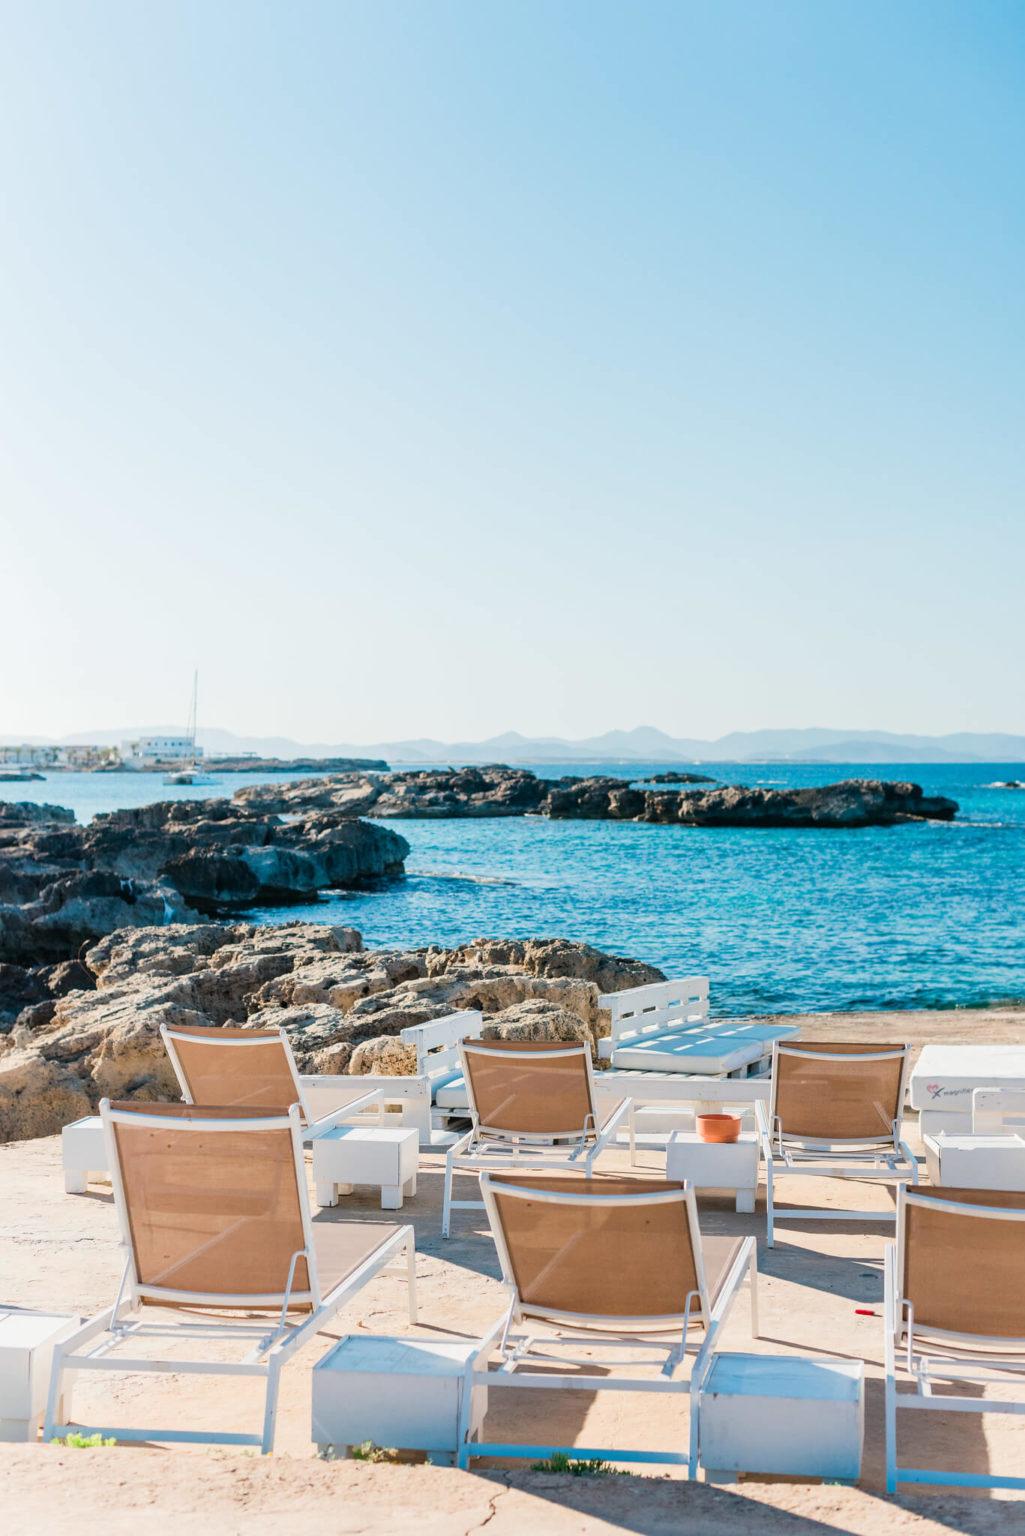 https://www.white-ibiza.com/wp-content/uploads/2020/03/formentera-beach-restaurants-chezz-gerdi-2020-02-1025x1536.jpg